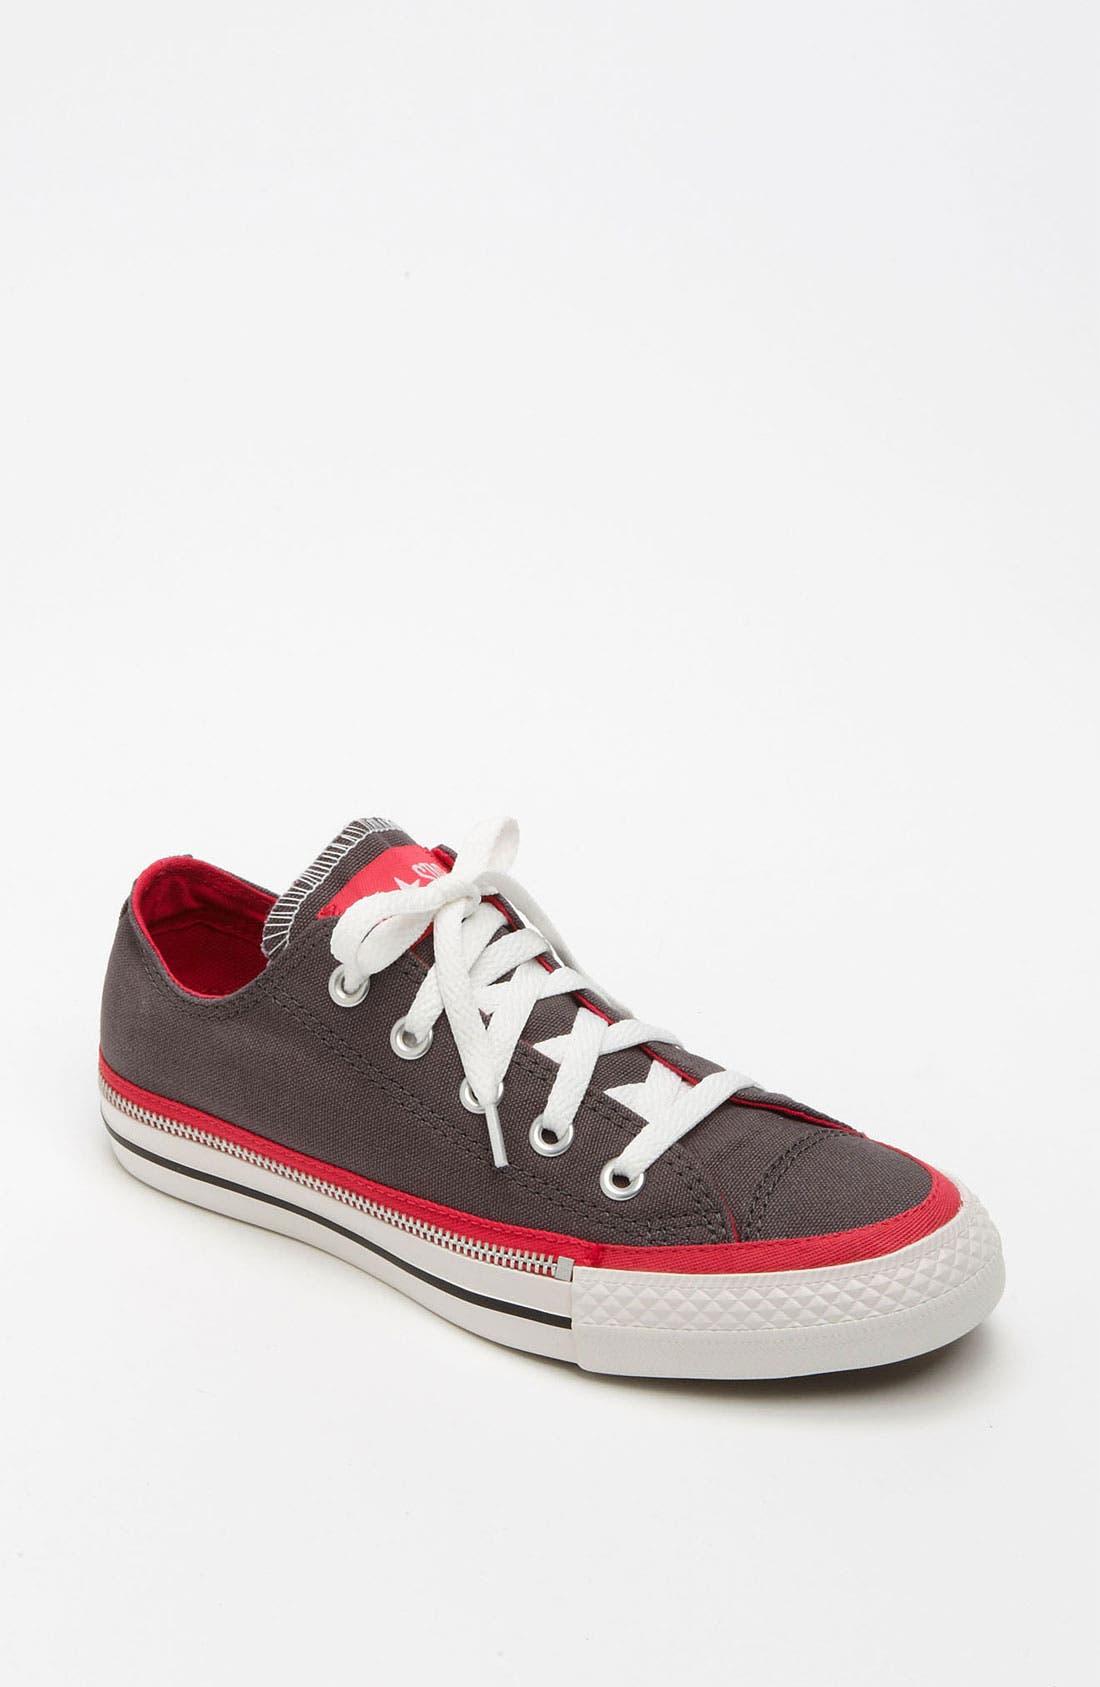 Main Image - Converse Chuck Taylor® Zipper Sneaker (Women)